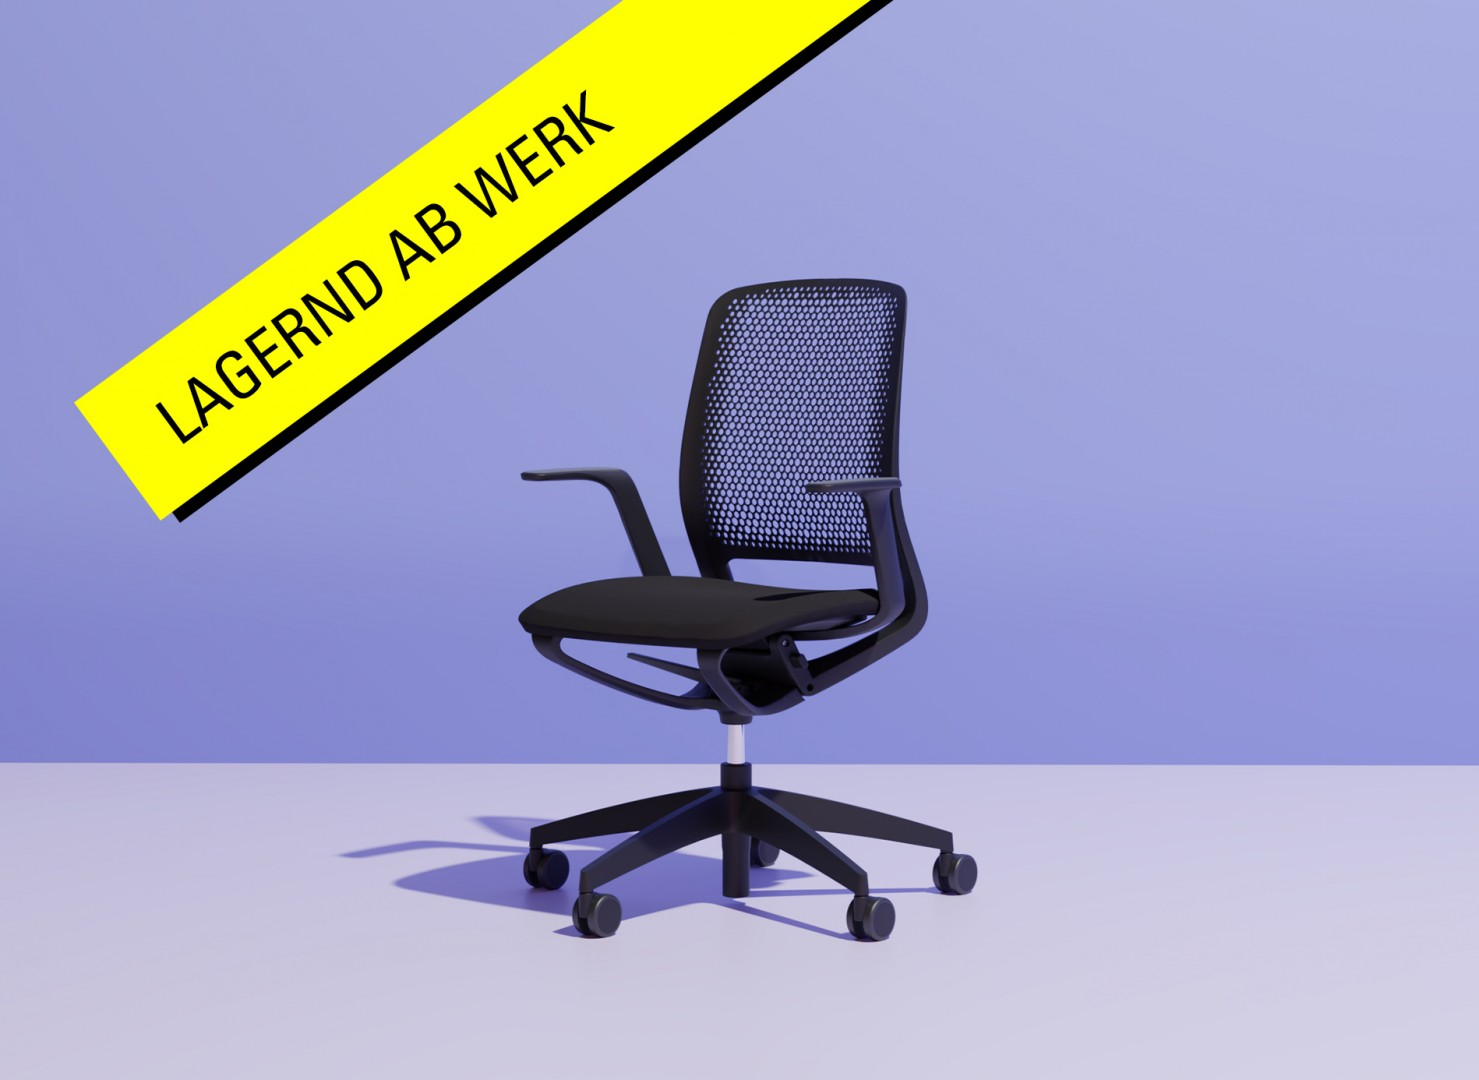 office buero sessel stuhl blaha semotion slider 2 1